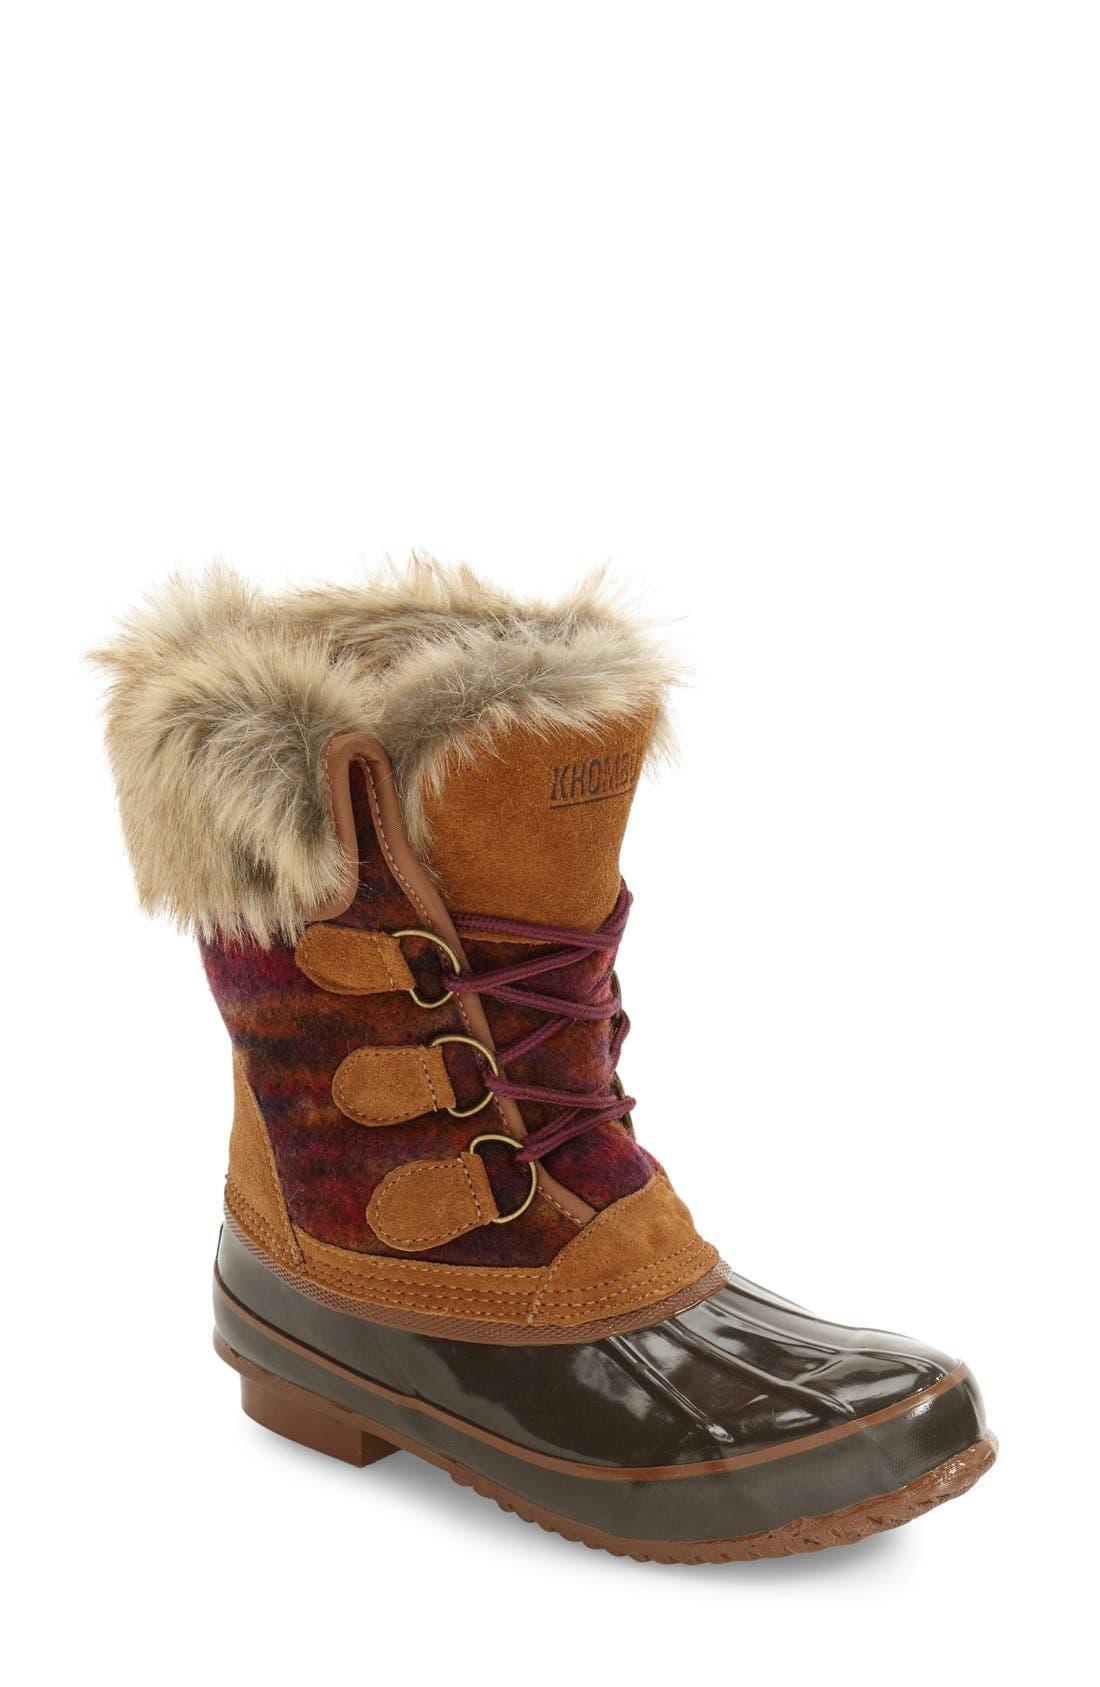 Alternate Image 1 Selected - Khombu Lace-Up Winter Boot (Women)